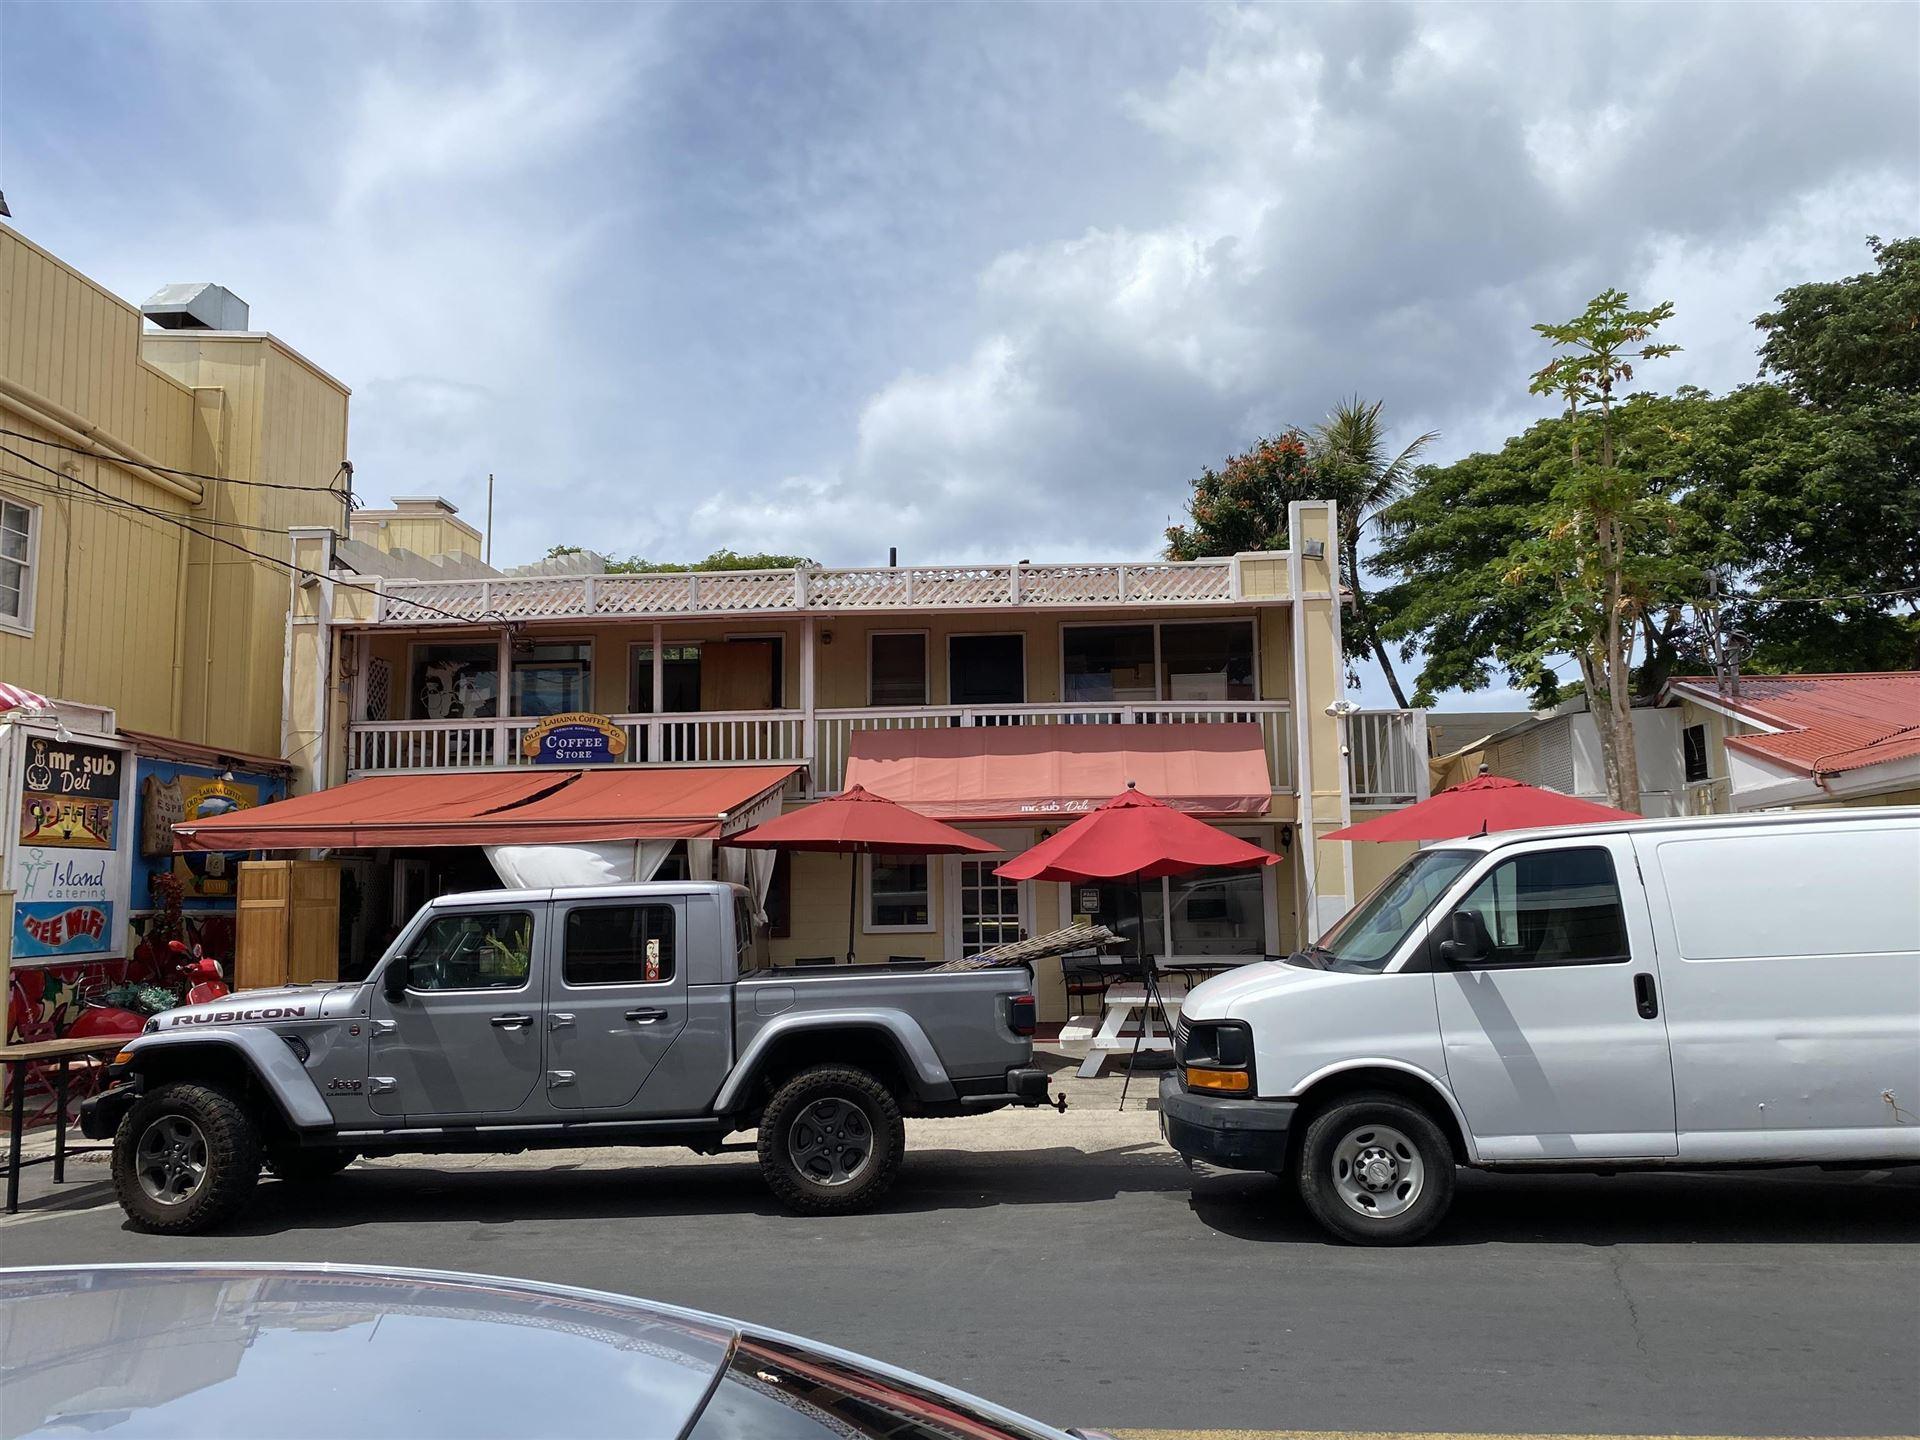 Photo of 129-143 Lahainaluna Rd, Lahaina, HI 96761 (MLS # 392898)